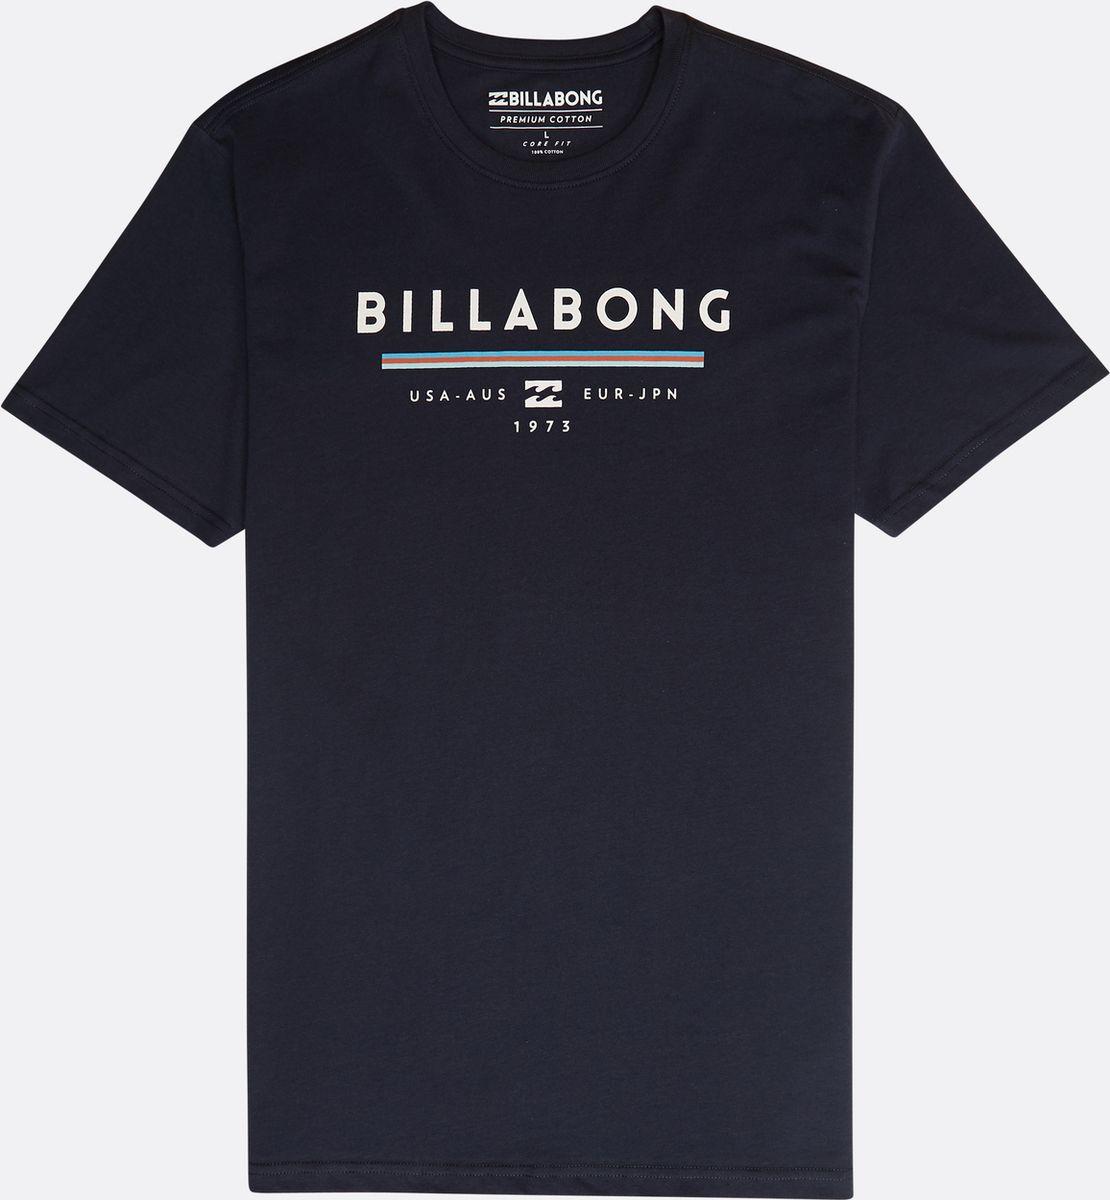 Футболка Billabong Unity Tee Ss футболка хлопковая nike tee club19 ss aj1504 451